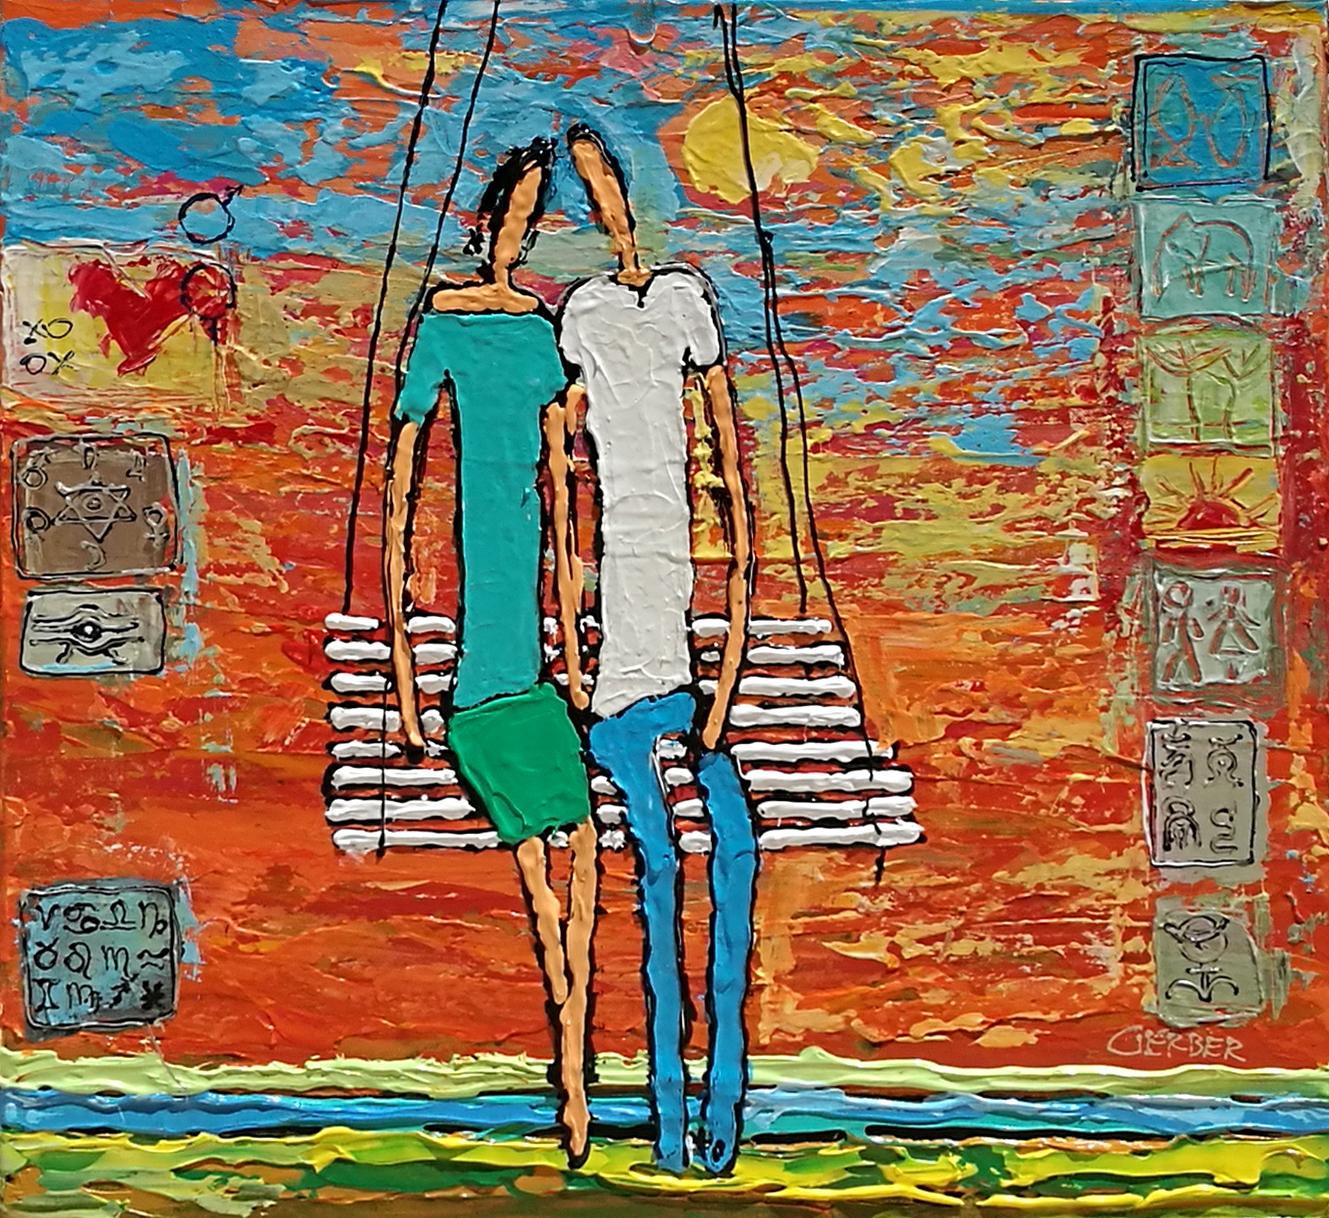 Dreaming by Alik Gerber